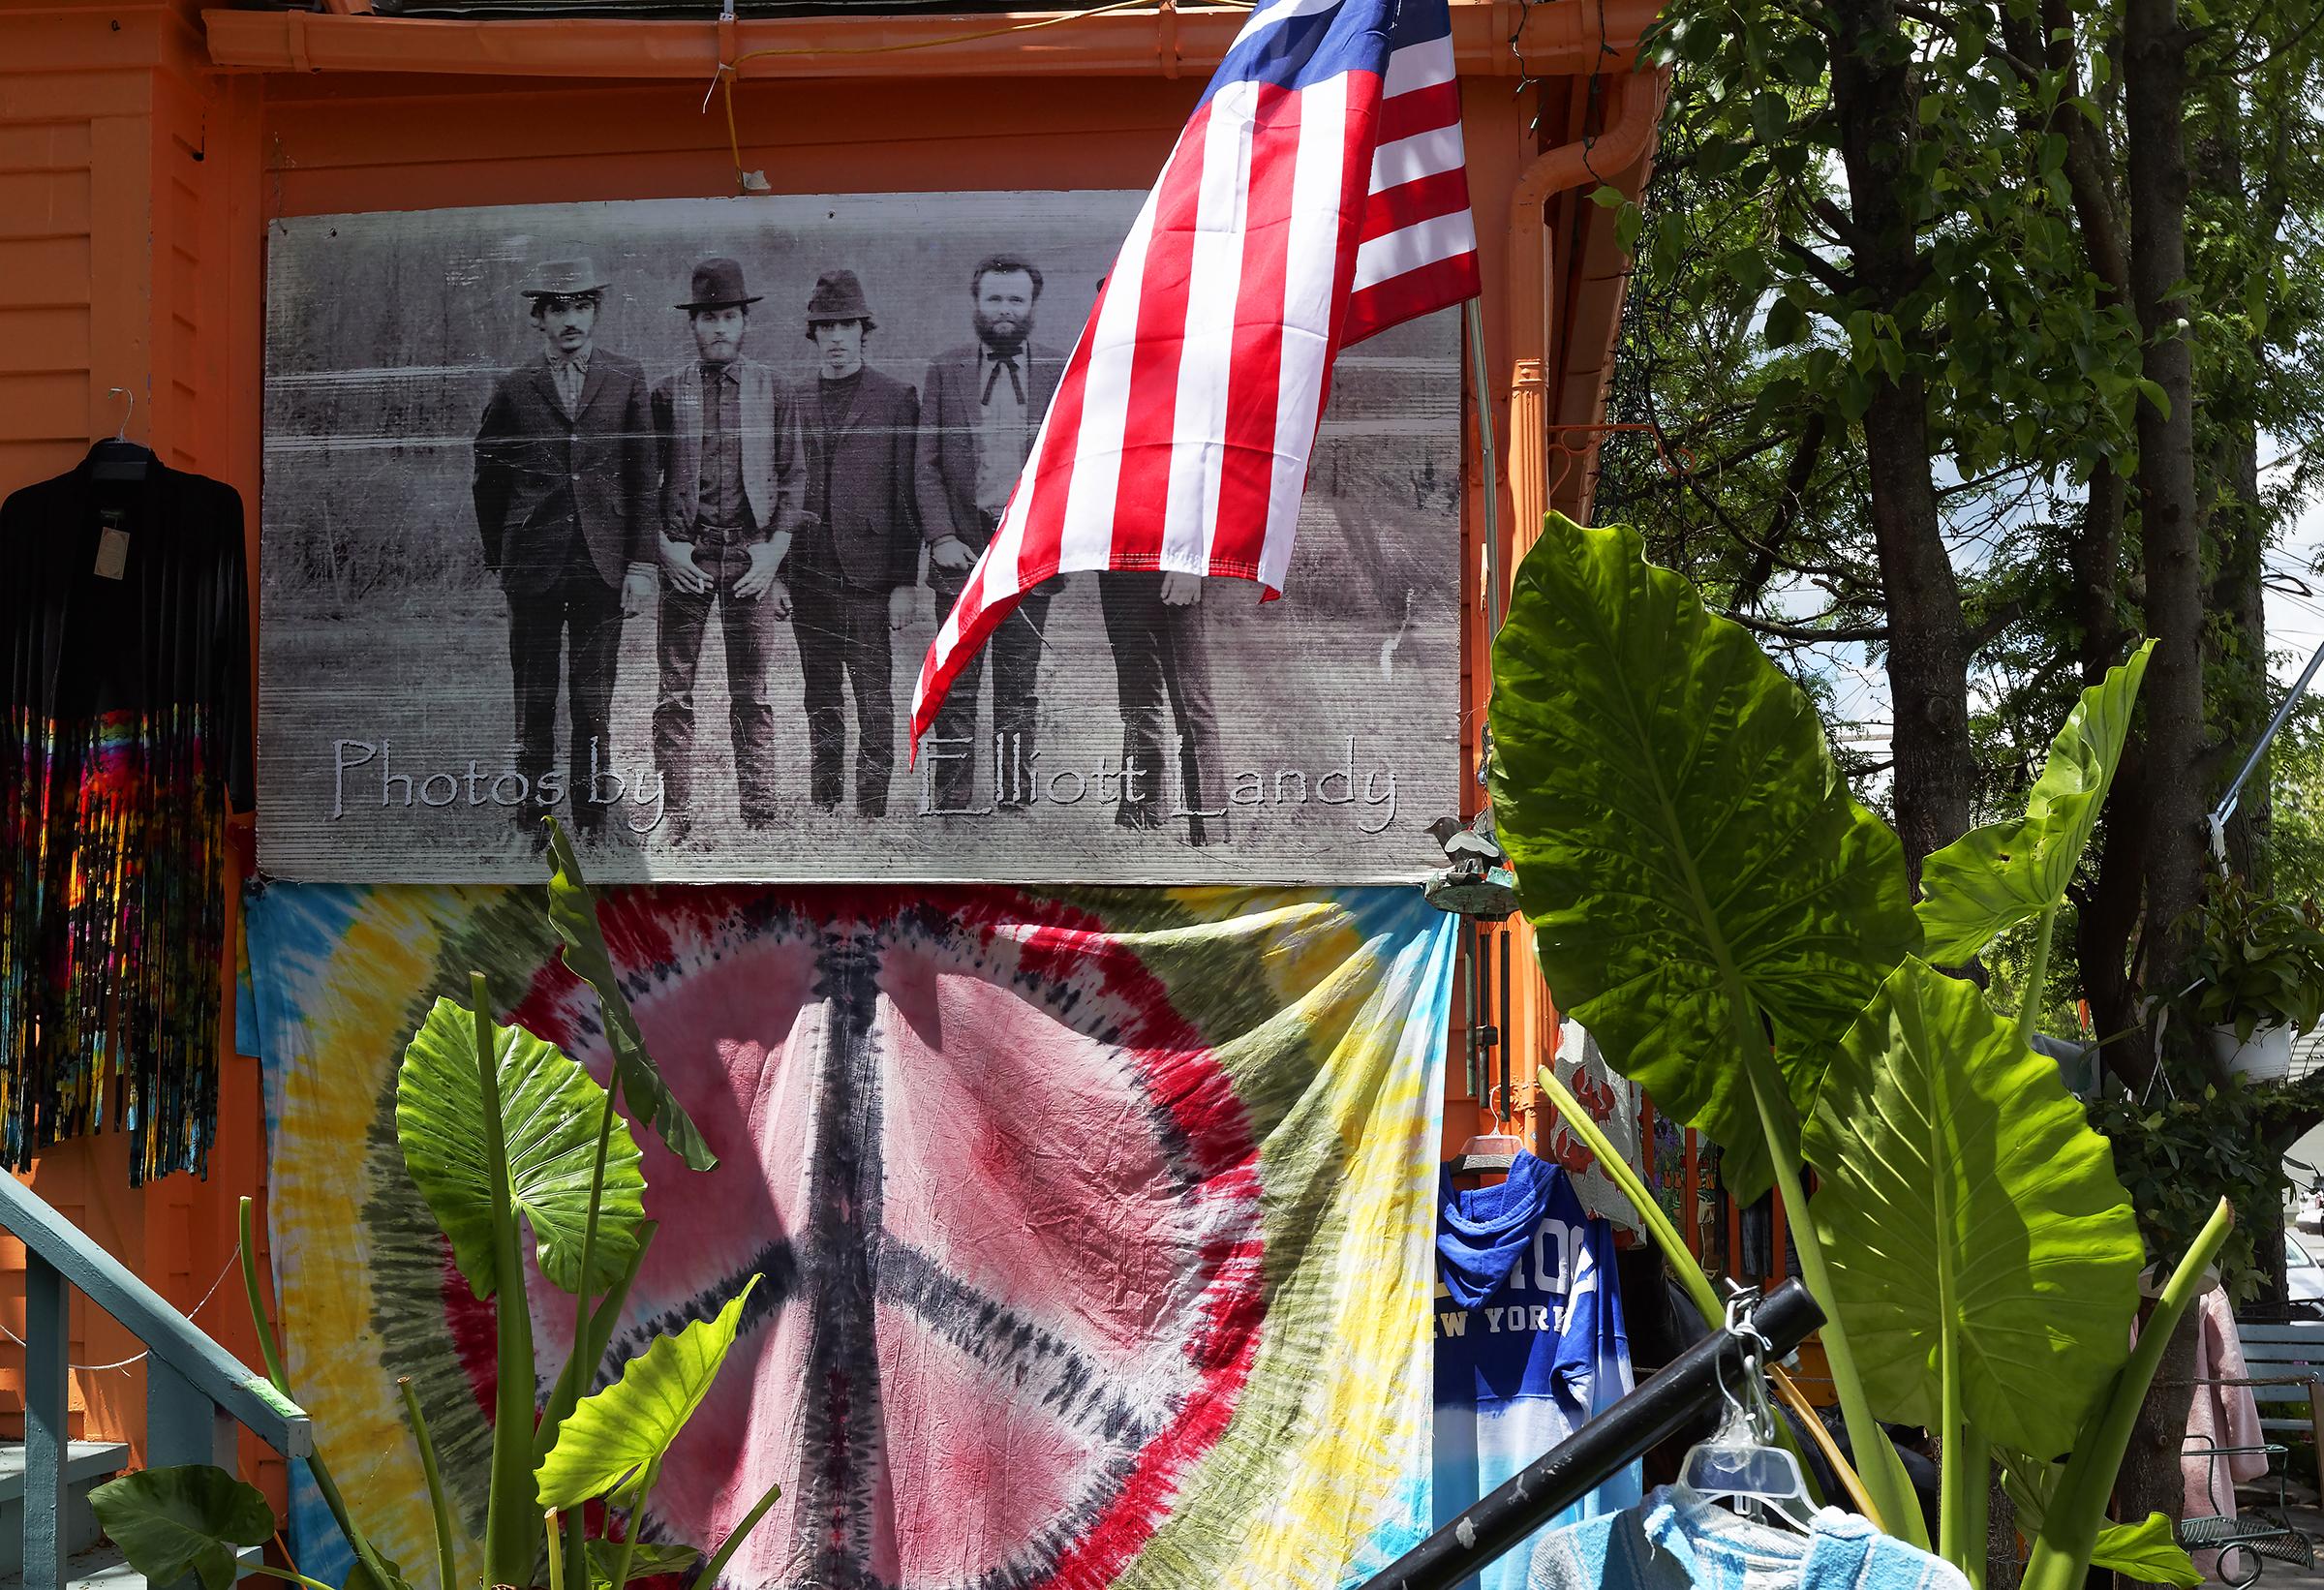 Gift shop in Woodstock, NY